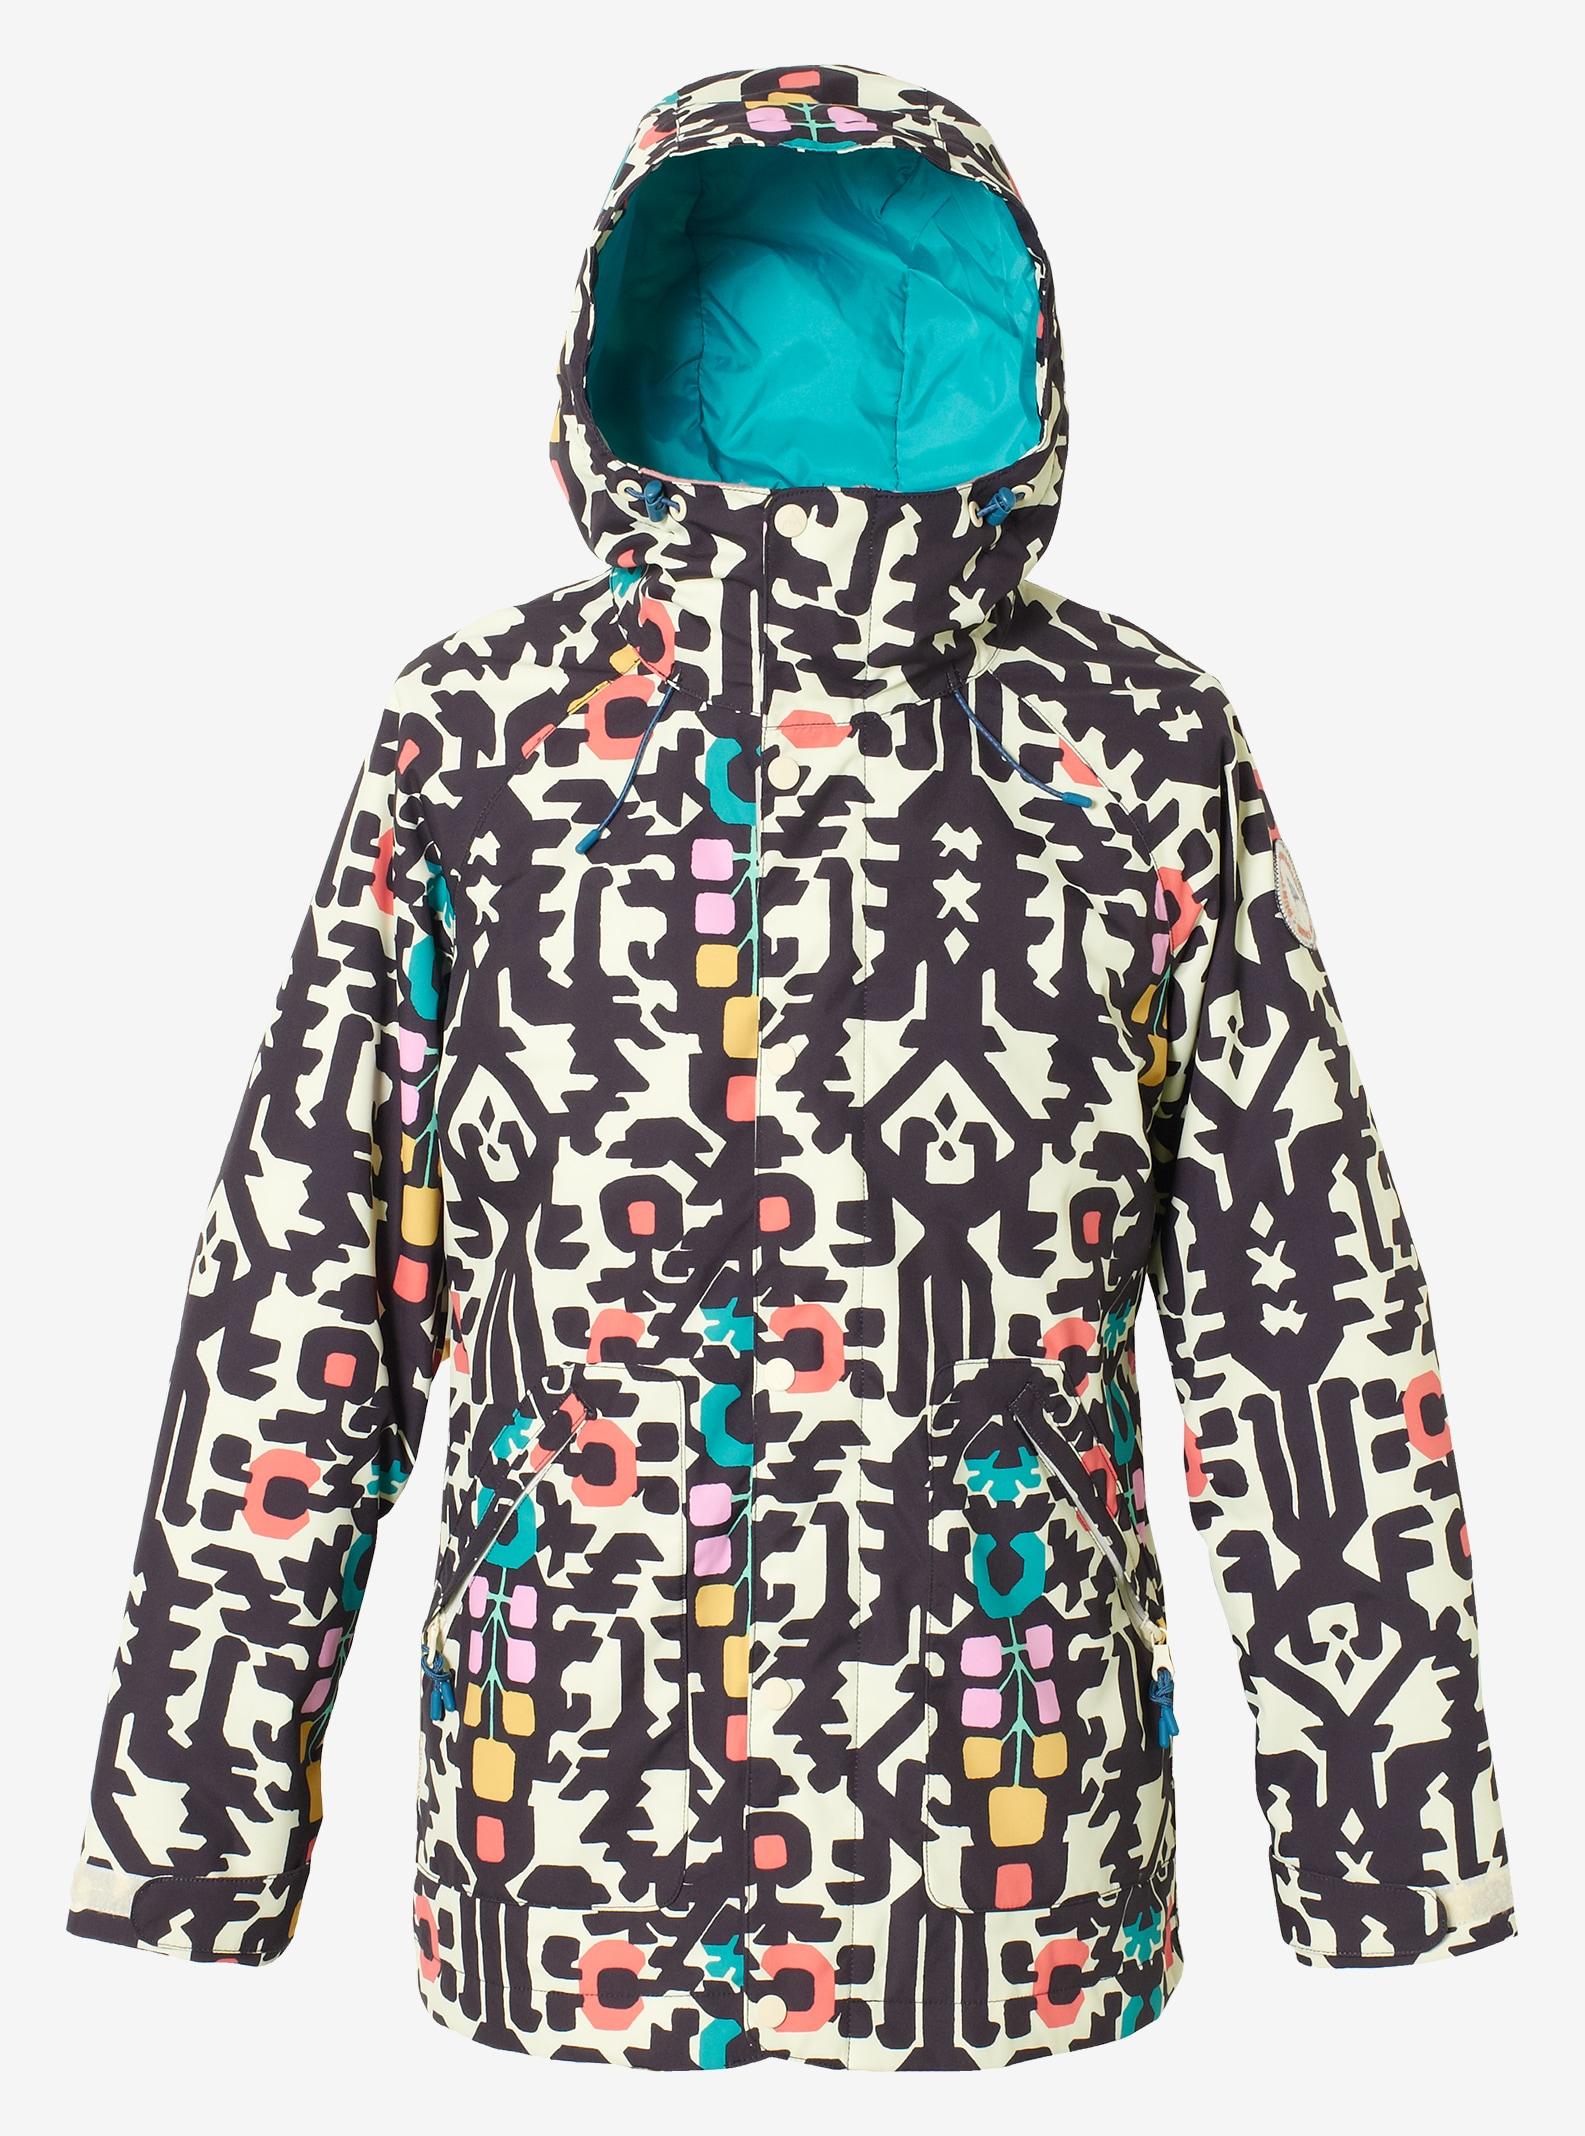 Women's Burton Eastfall Jacket shown in Young Folks / Everglade